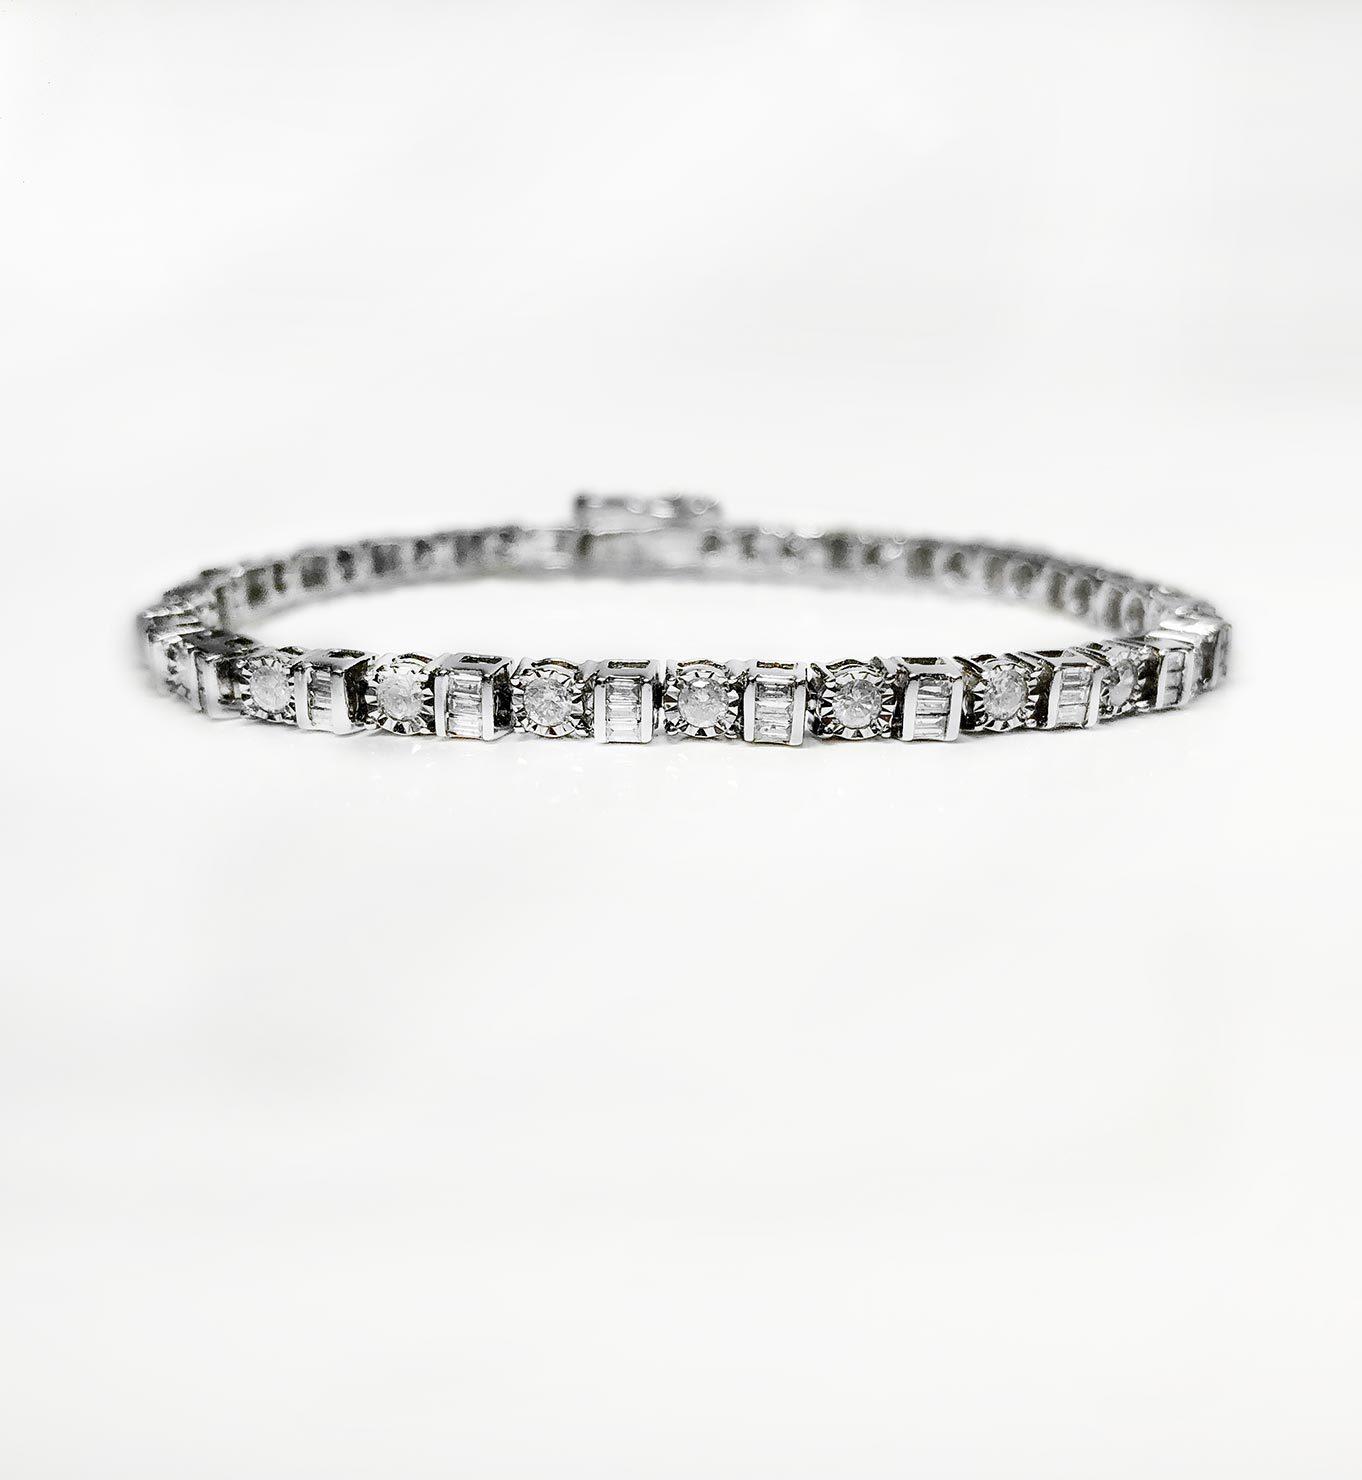 14K White Gold 1.50tcw Diamonds Tennis Bracelet I-12940